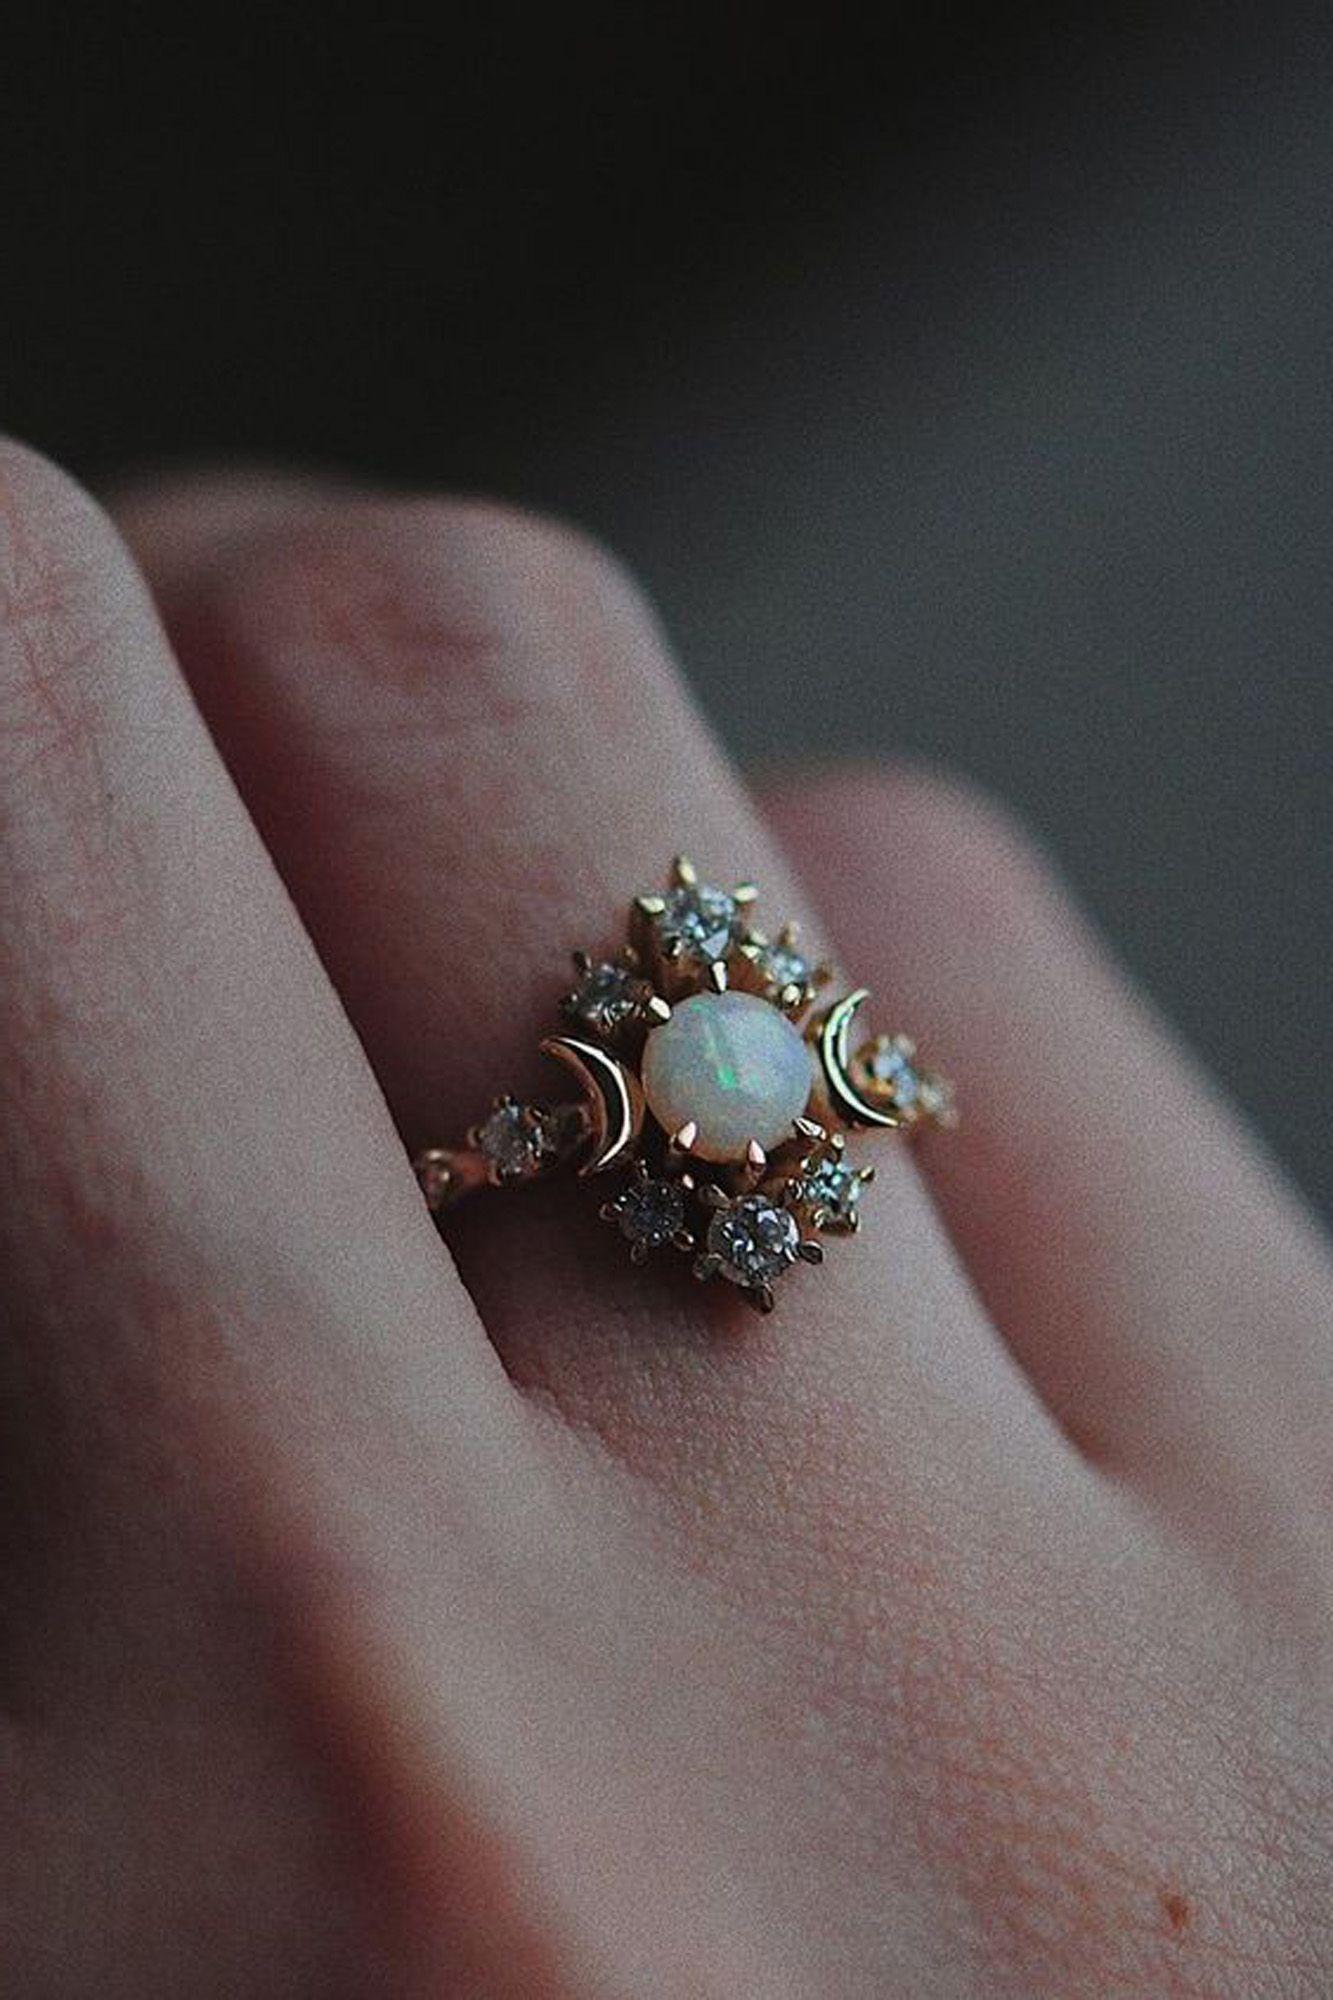 cute opal moon star crystal rings engagement wedding graduation for women for teen girls fashion jew